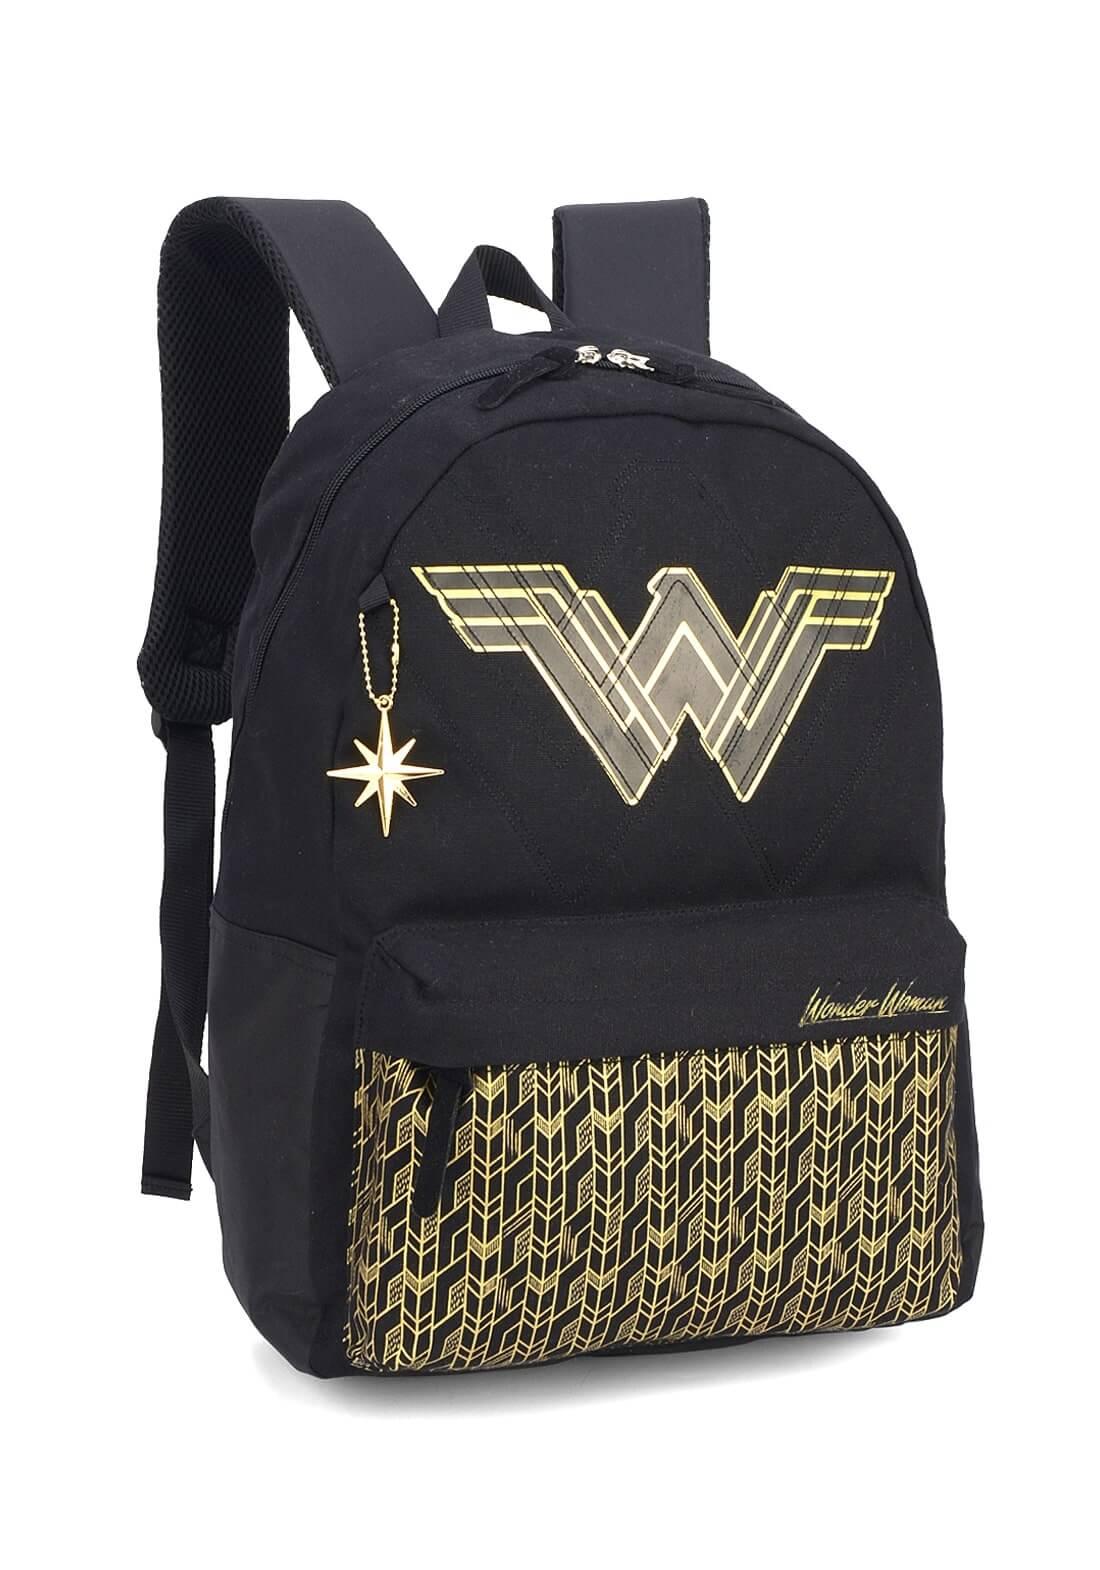 Mochila Notebook Mulher Maravilha Wonder Woman Pret Original